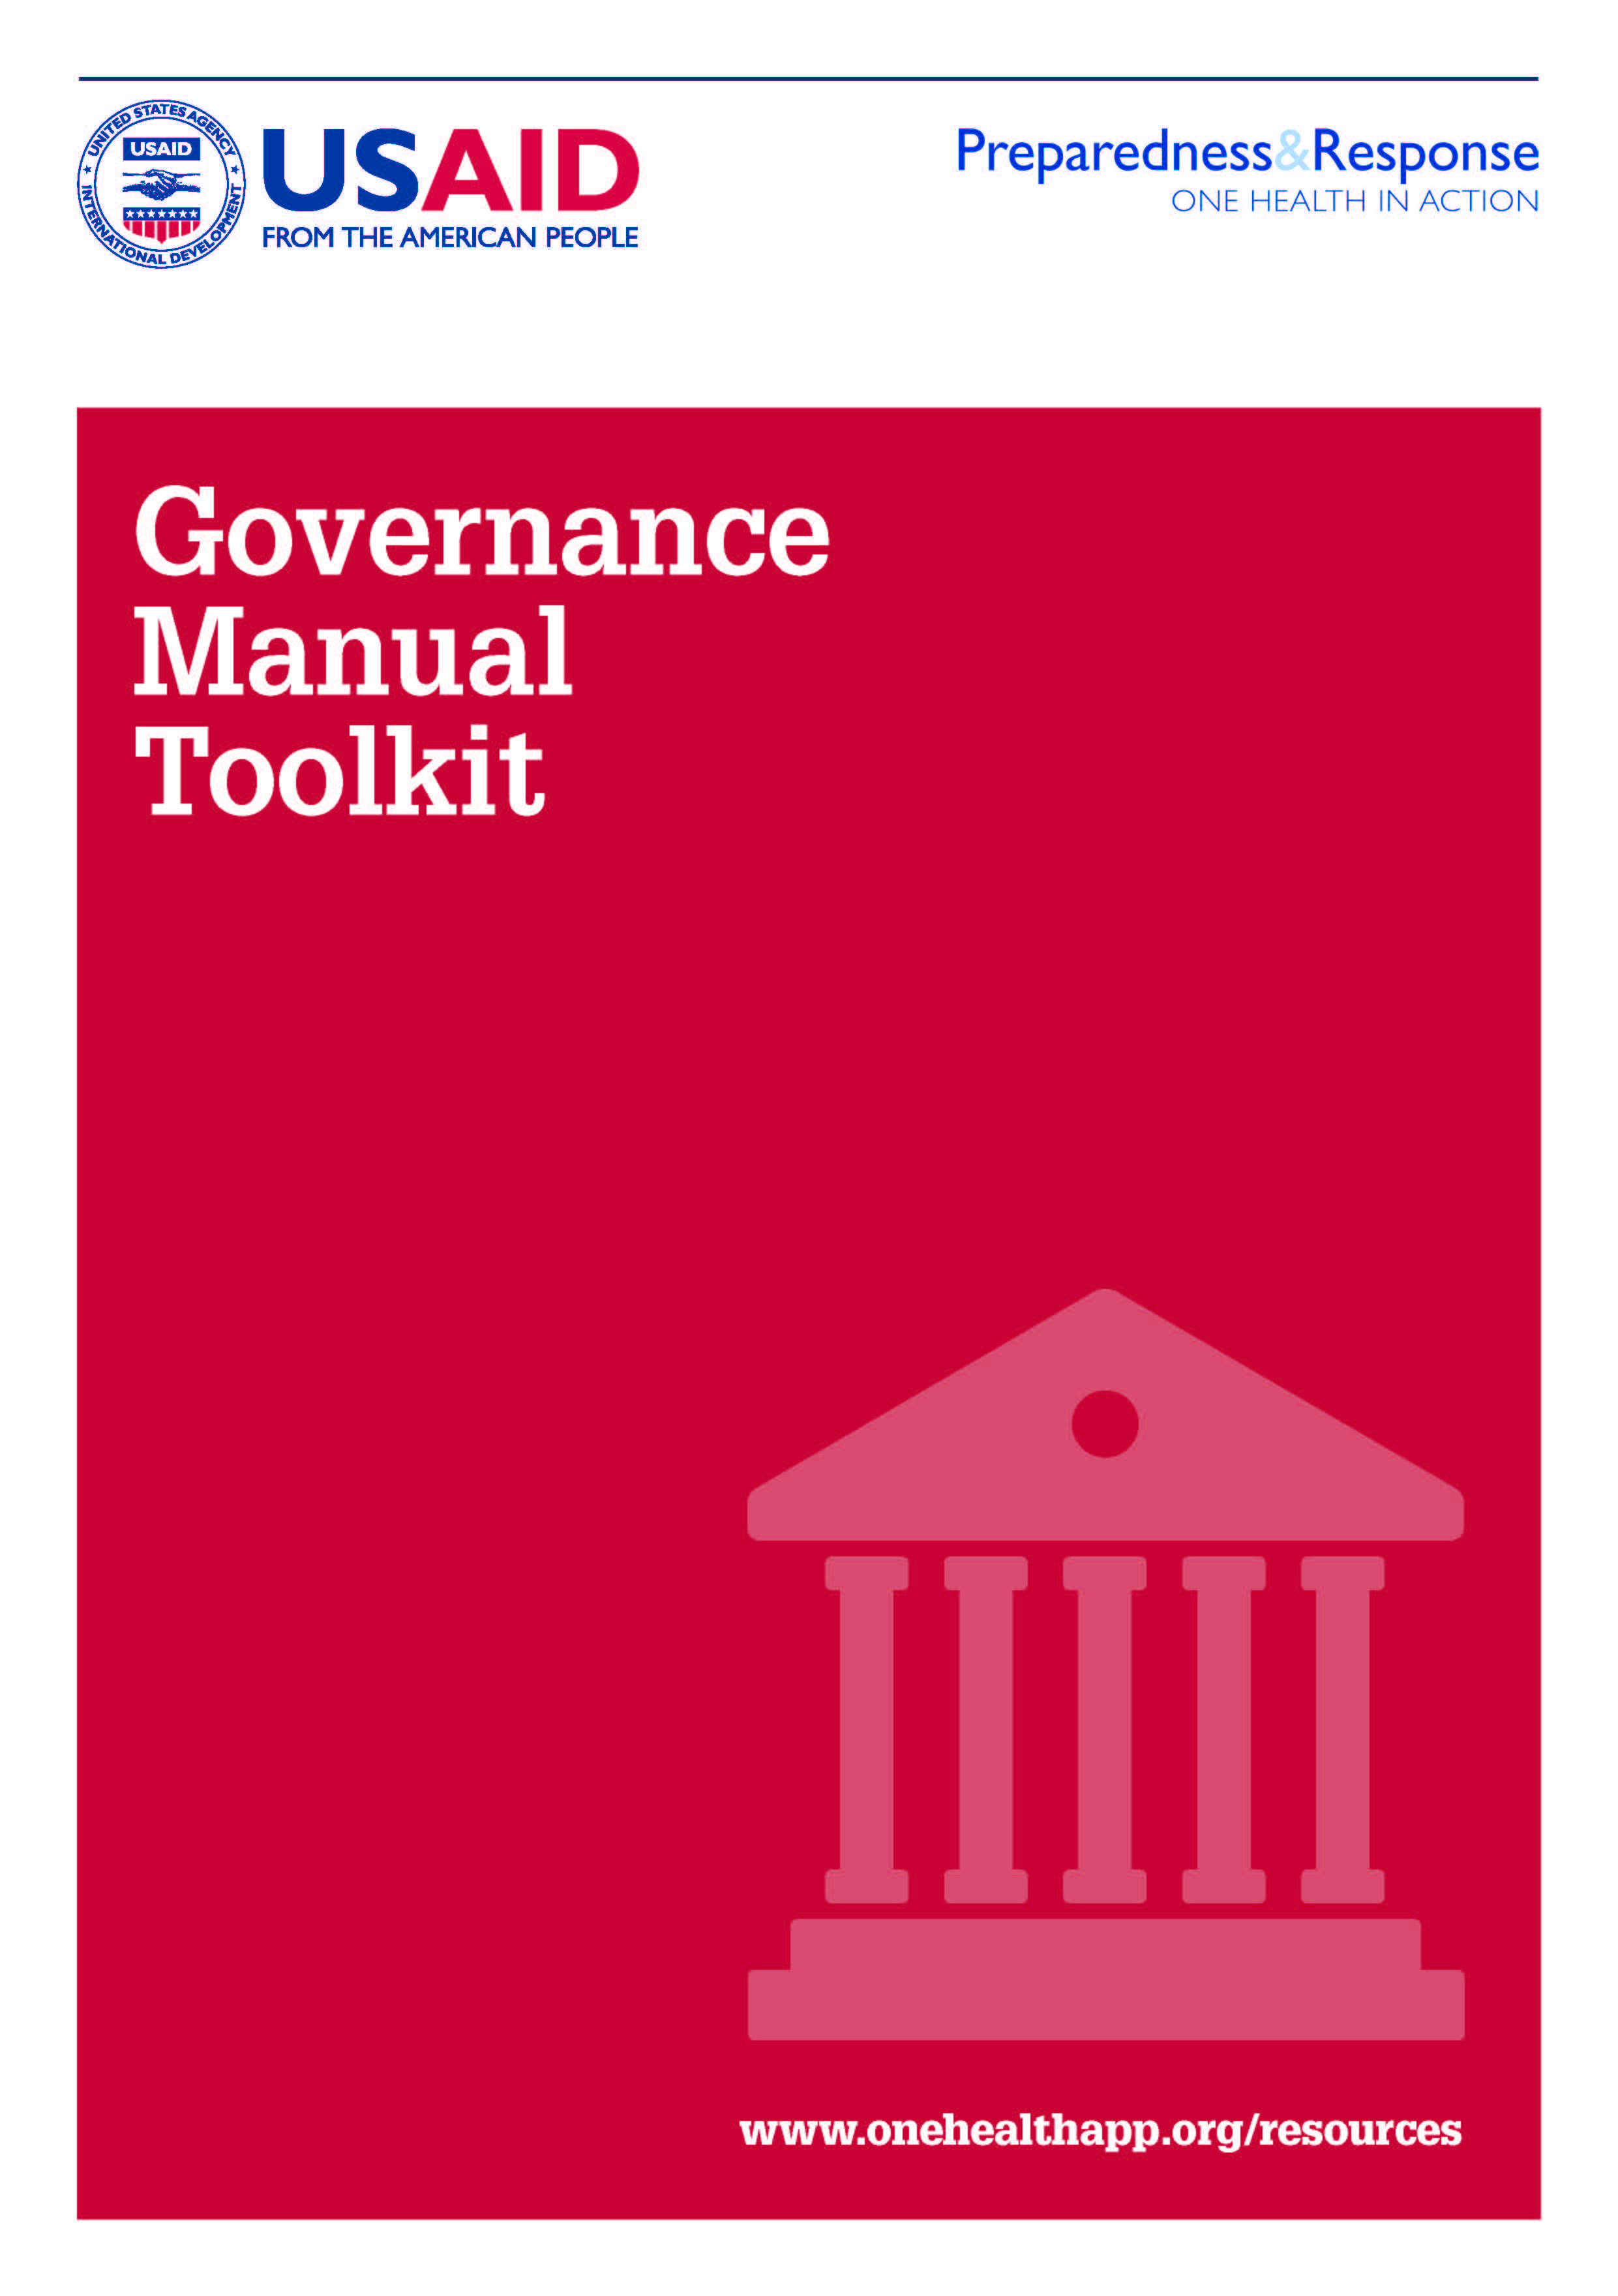 Governance Manual Toolkit